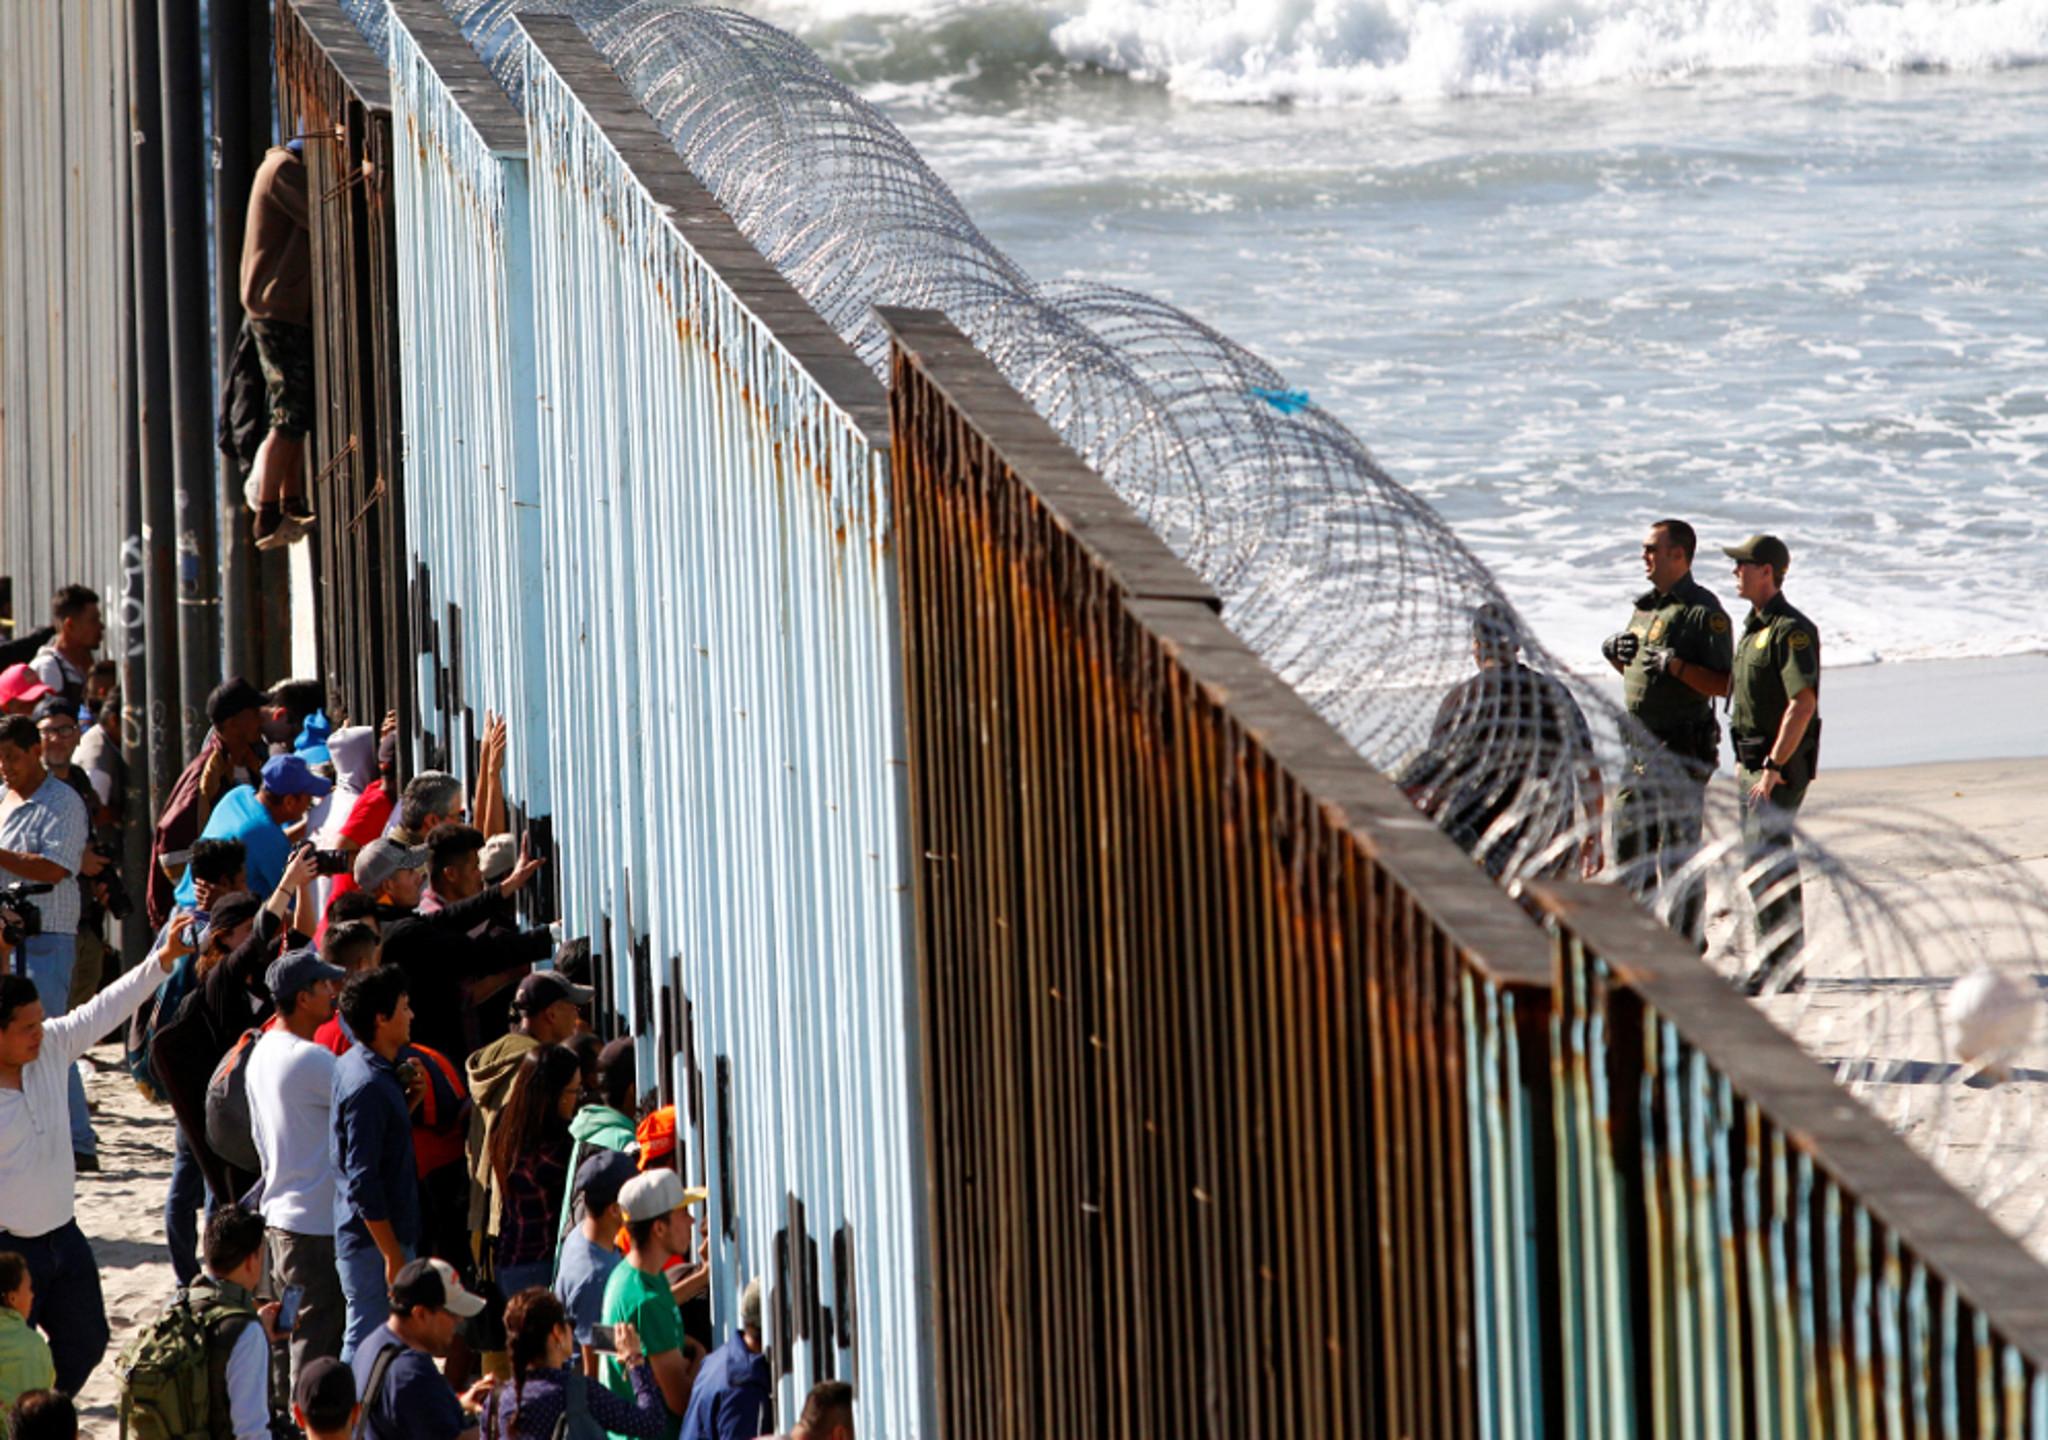 Refuerzo de fronteras con concertinas